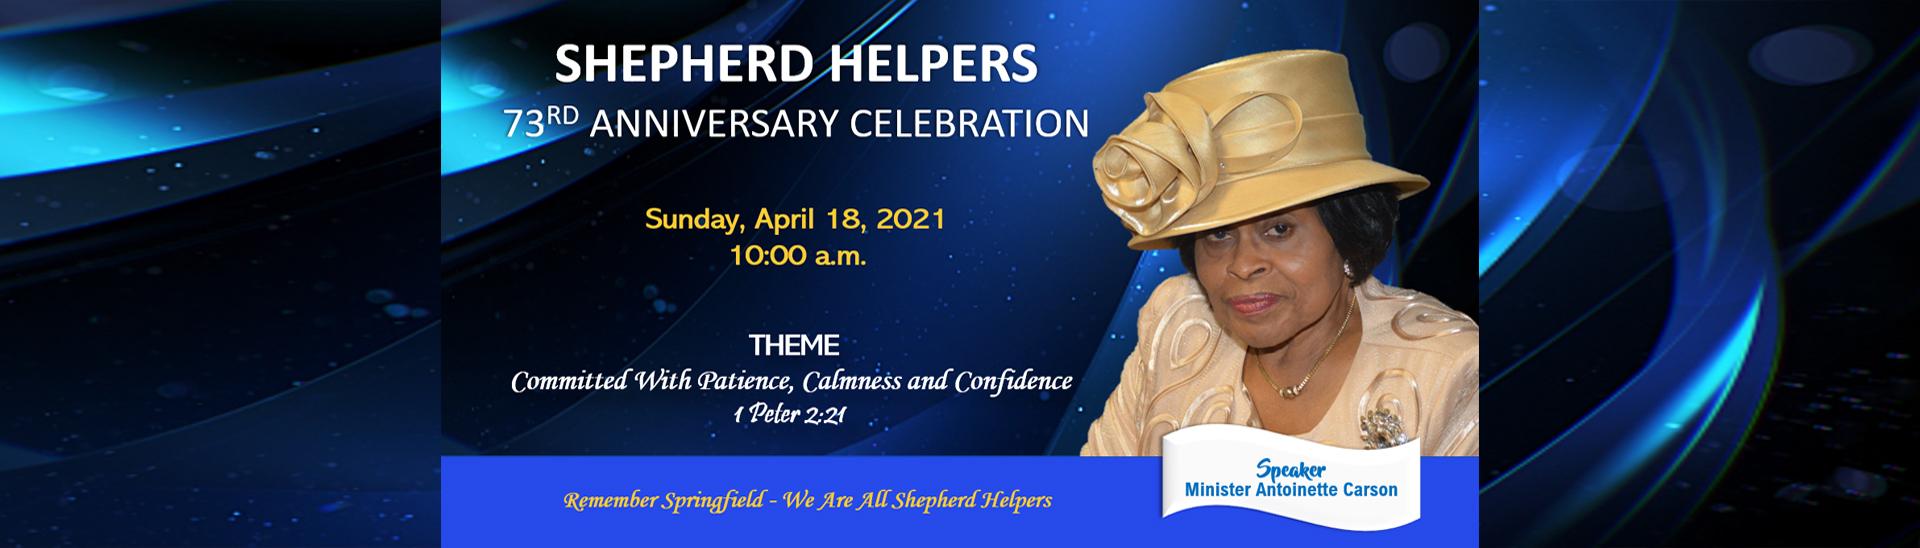 https://0201.nccdn.net/1_2/000/000/199/b60/shepherd-helpers-anniversary-2021-cover.jpg